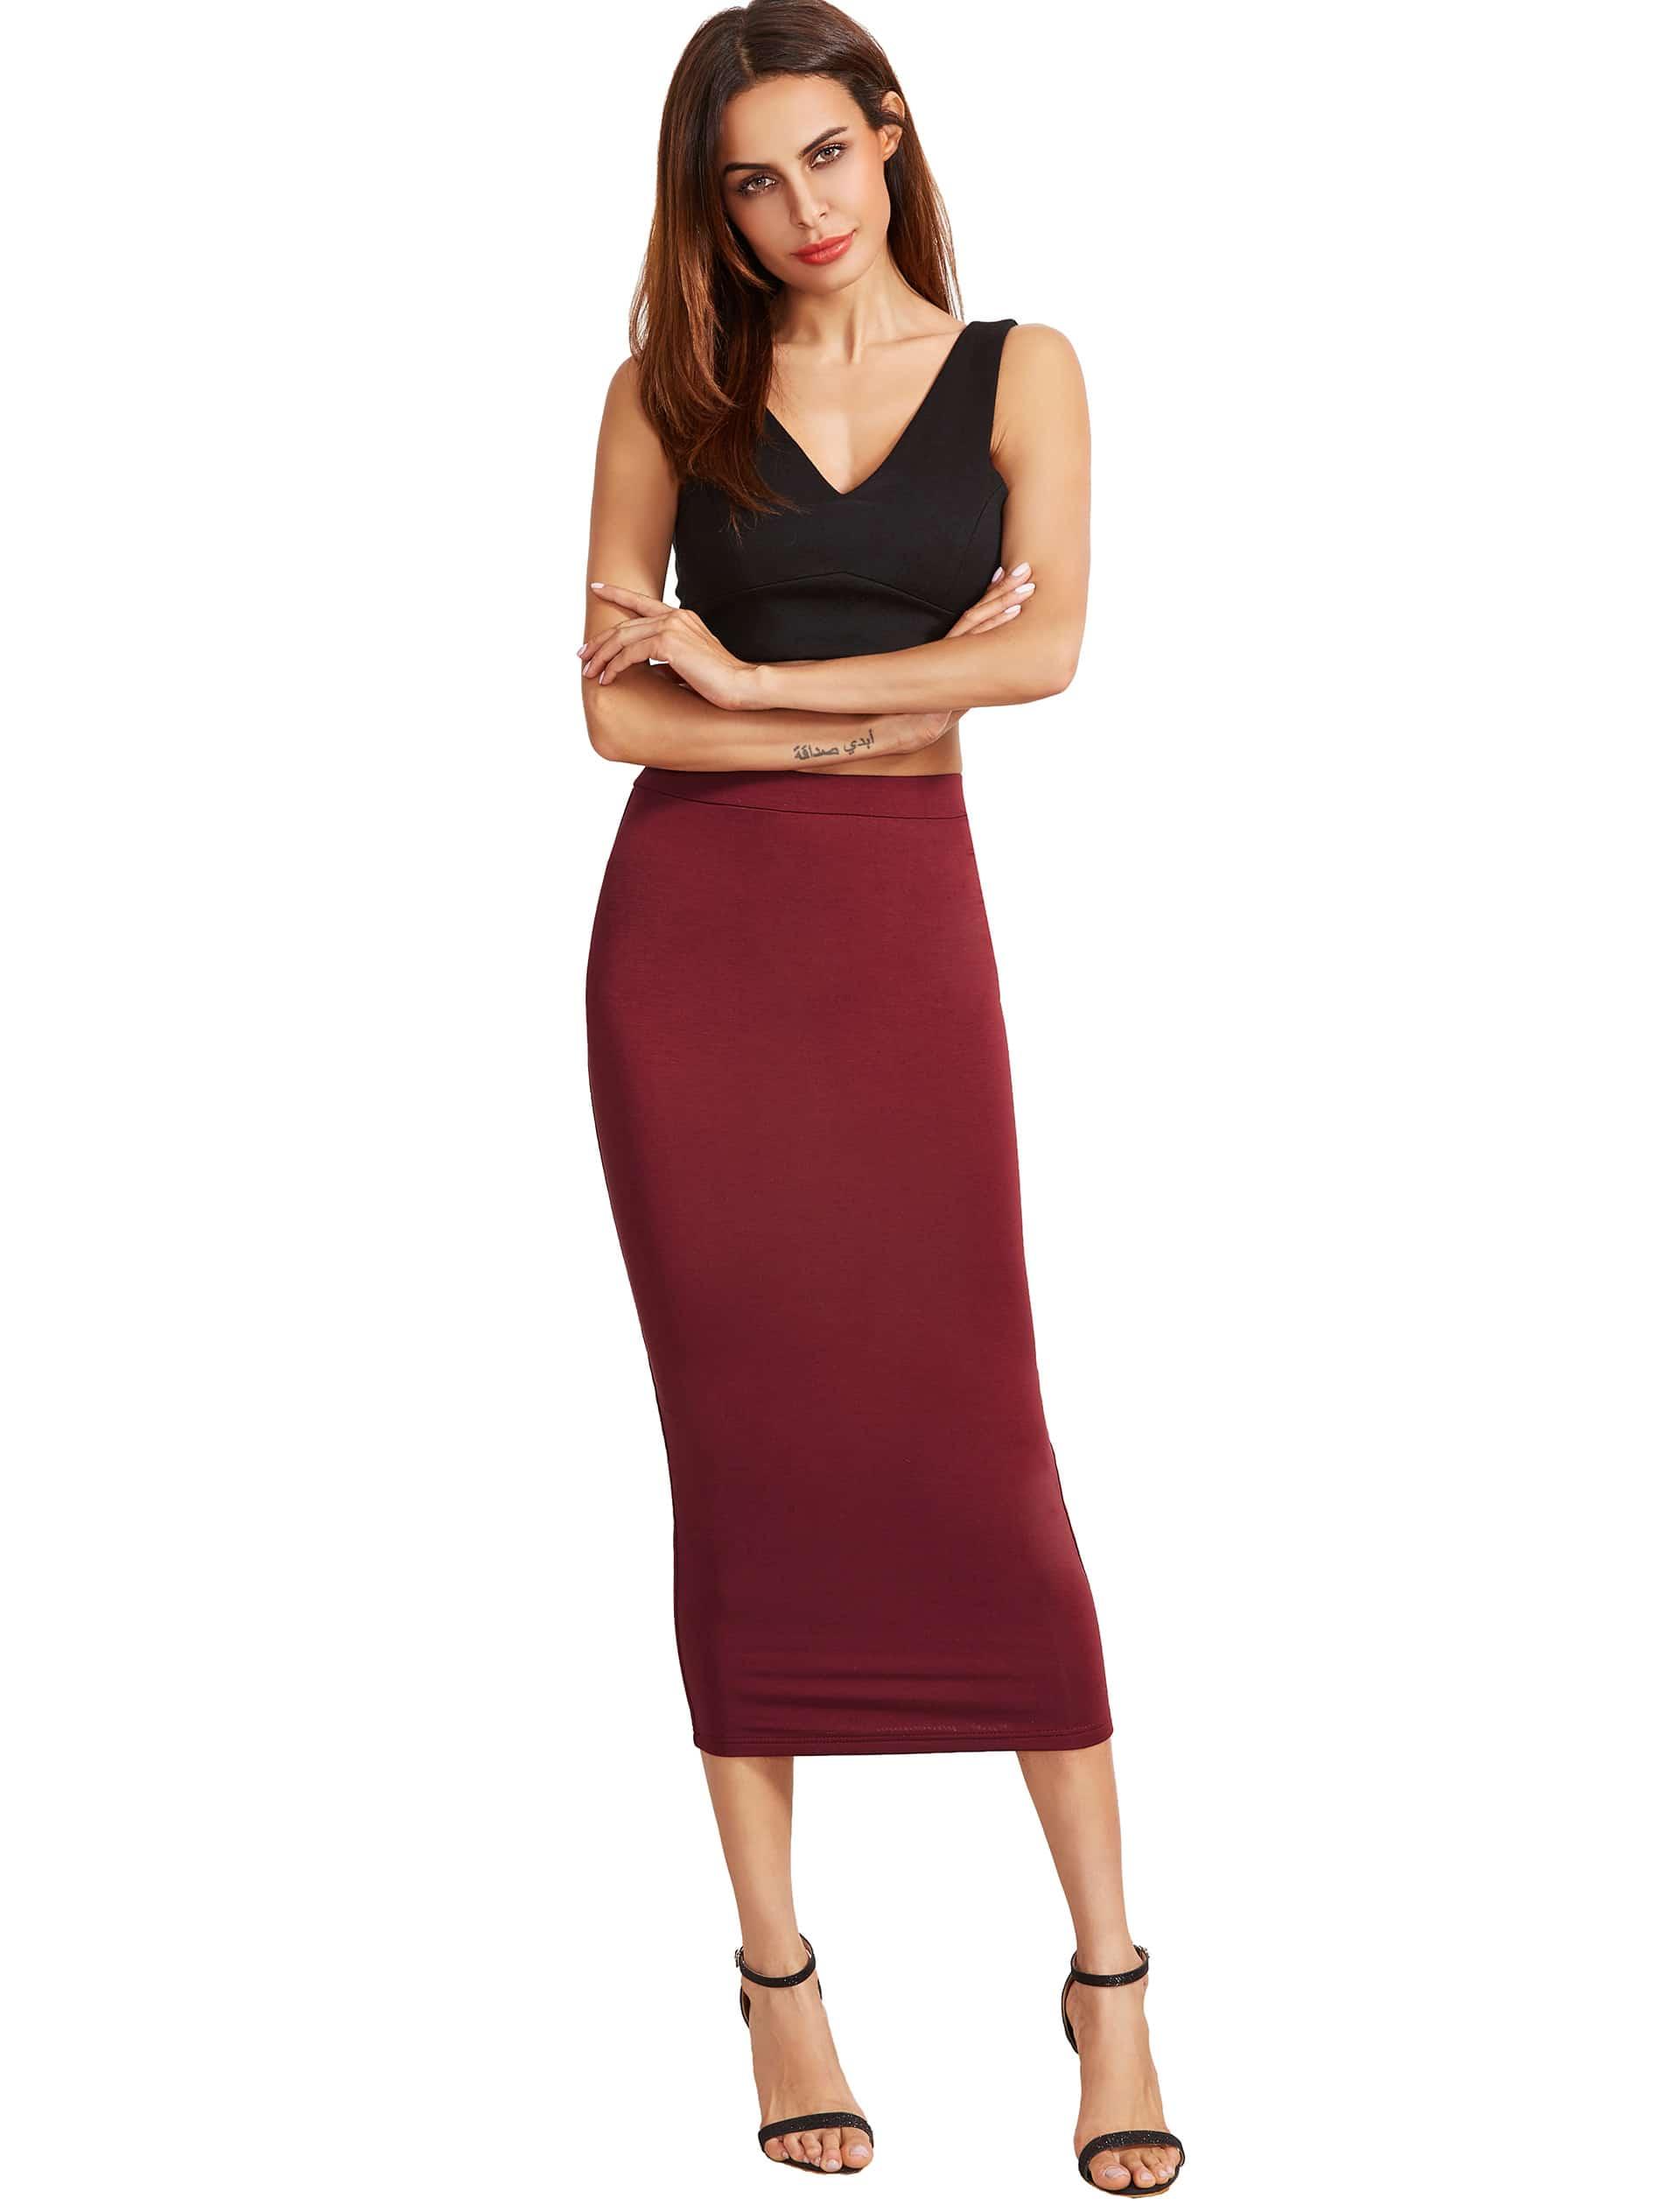 High Waist Sheath Skirt